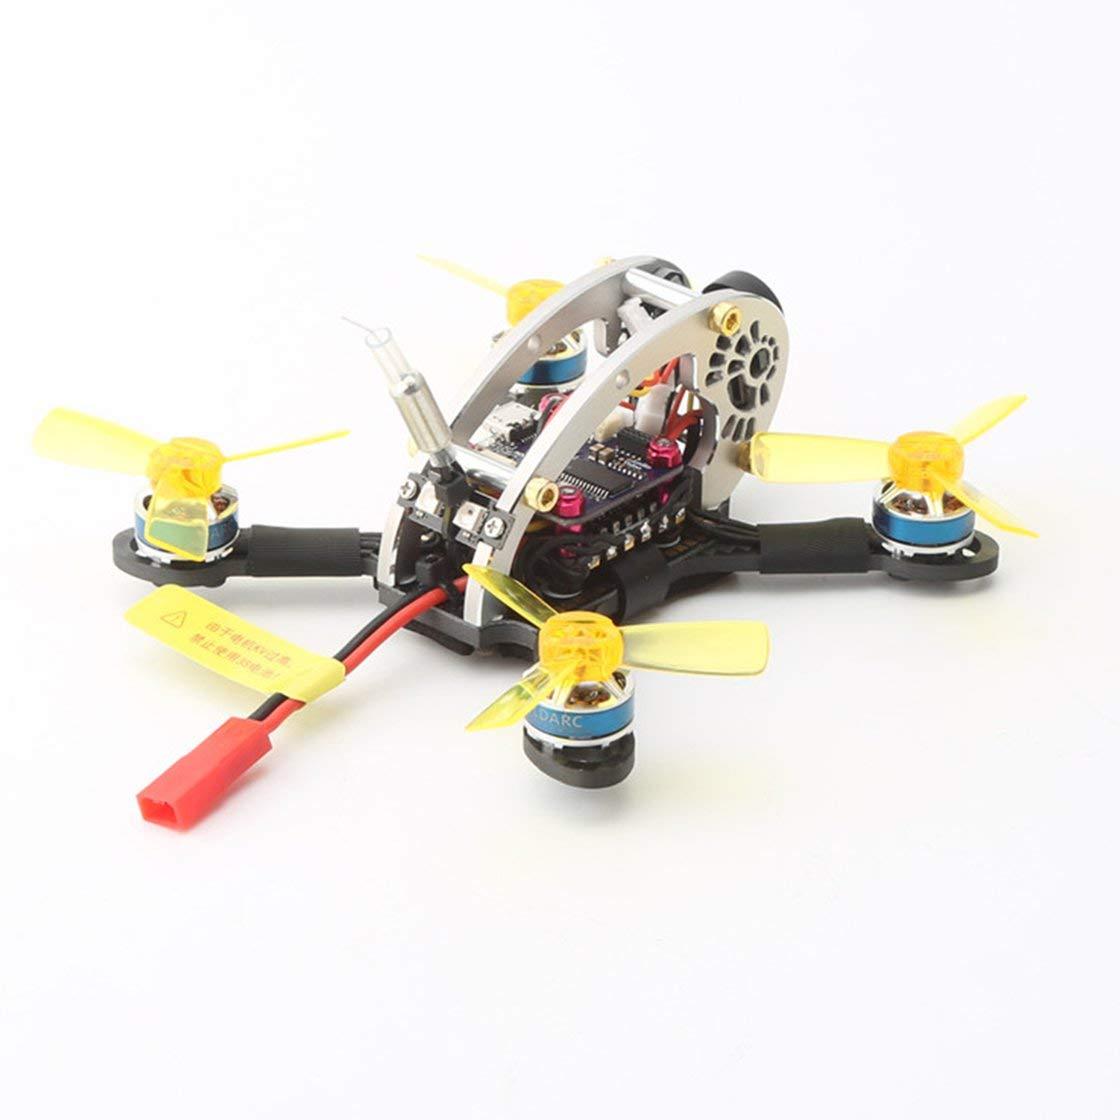 Hermosairis LDARC Flyegg 130 V2 5,8G Micro Mini Brushless FPV RC Racing Drone Quadcopter mit 130 mW 16CH VTX Kamera OSD PNP Versio